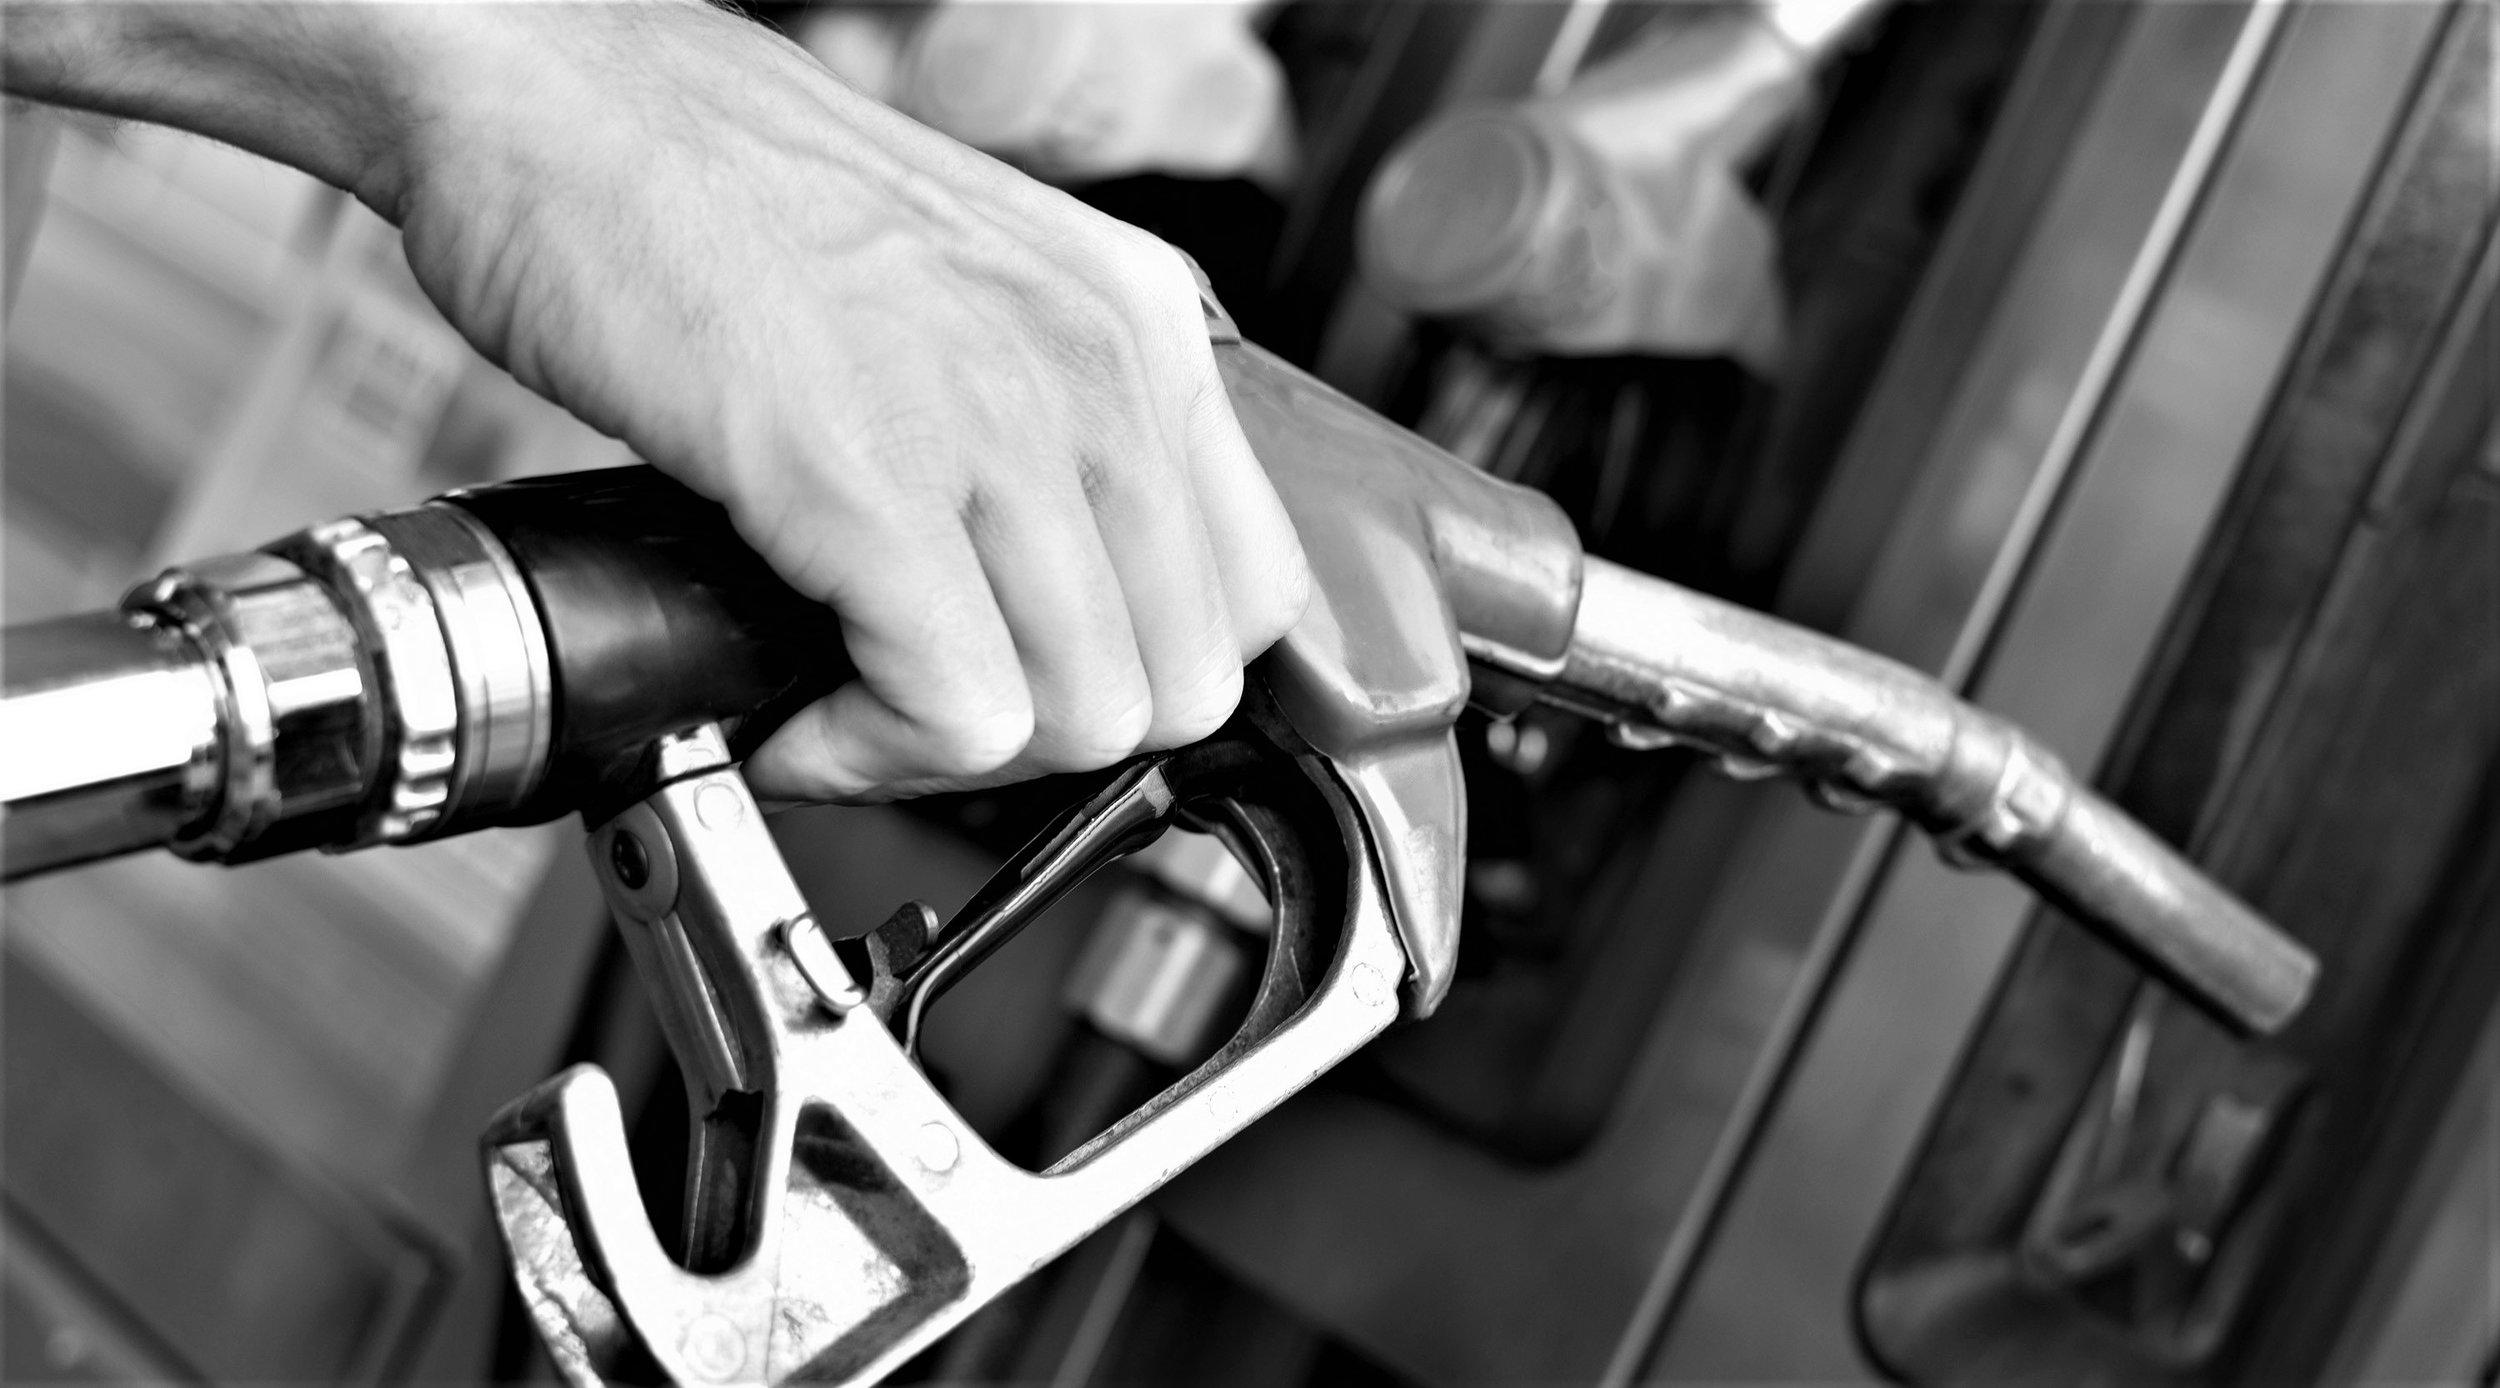 orgeon-gas-pump bw.jpg